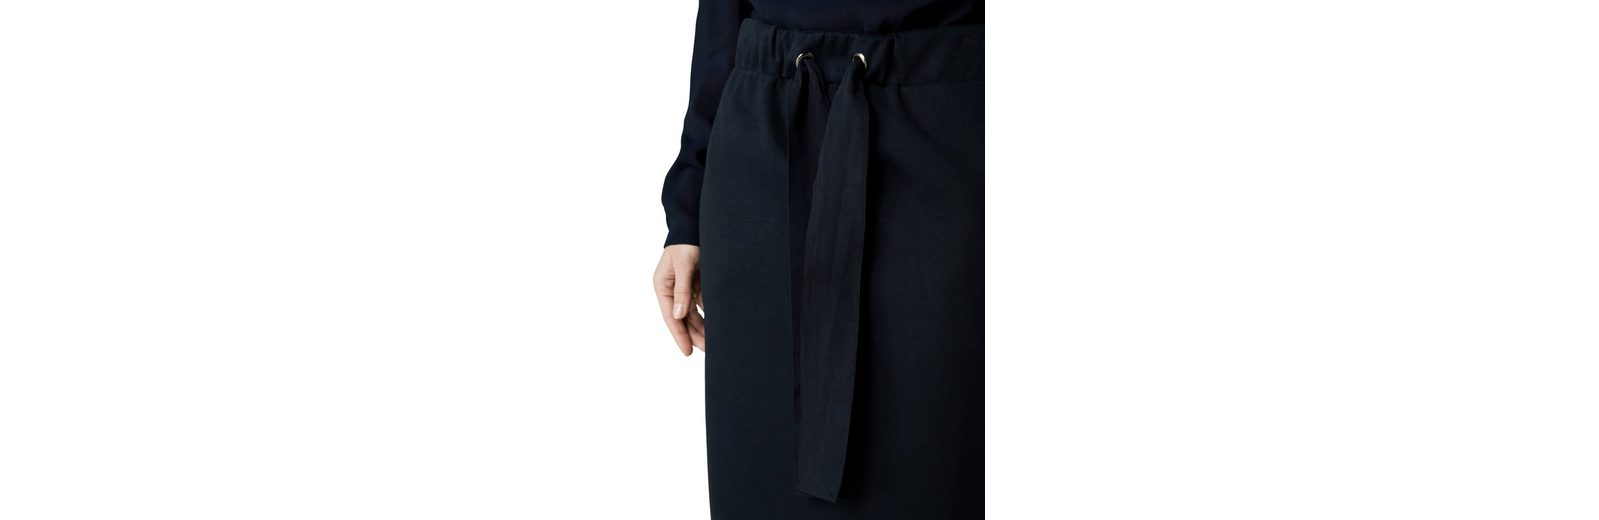 Marc O'Polo Jerseyrock Verkauf Wie Viel Neue Stile Ebay Auslass OvMWl7RVz